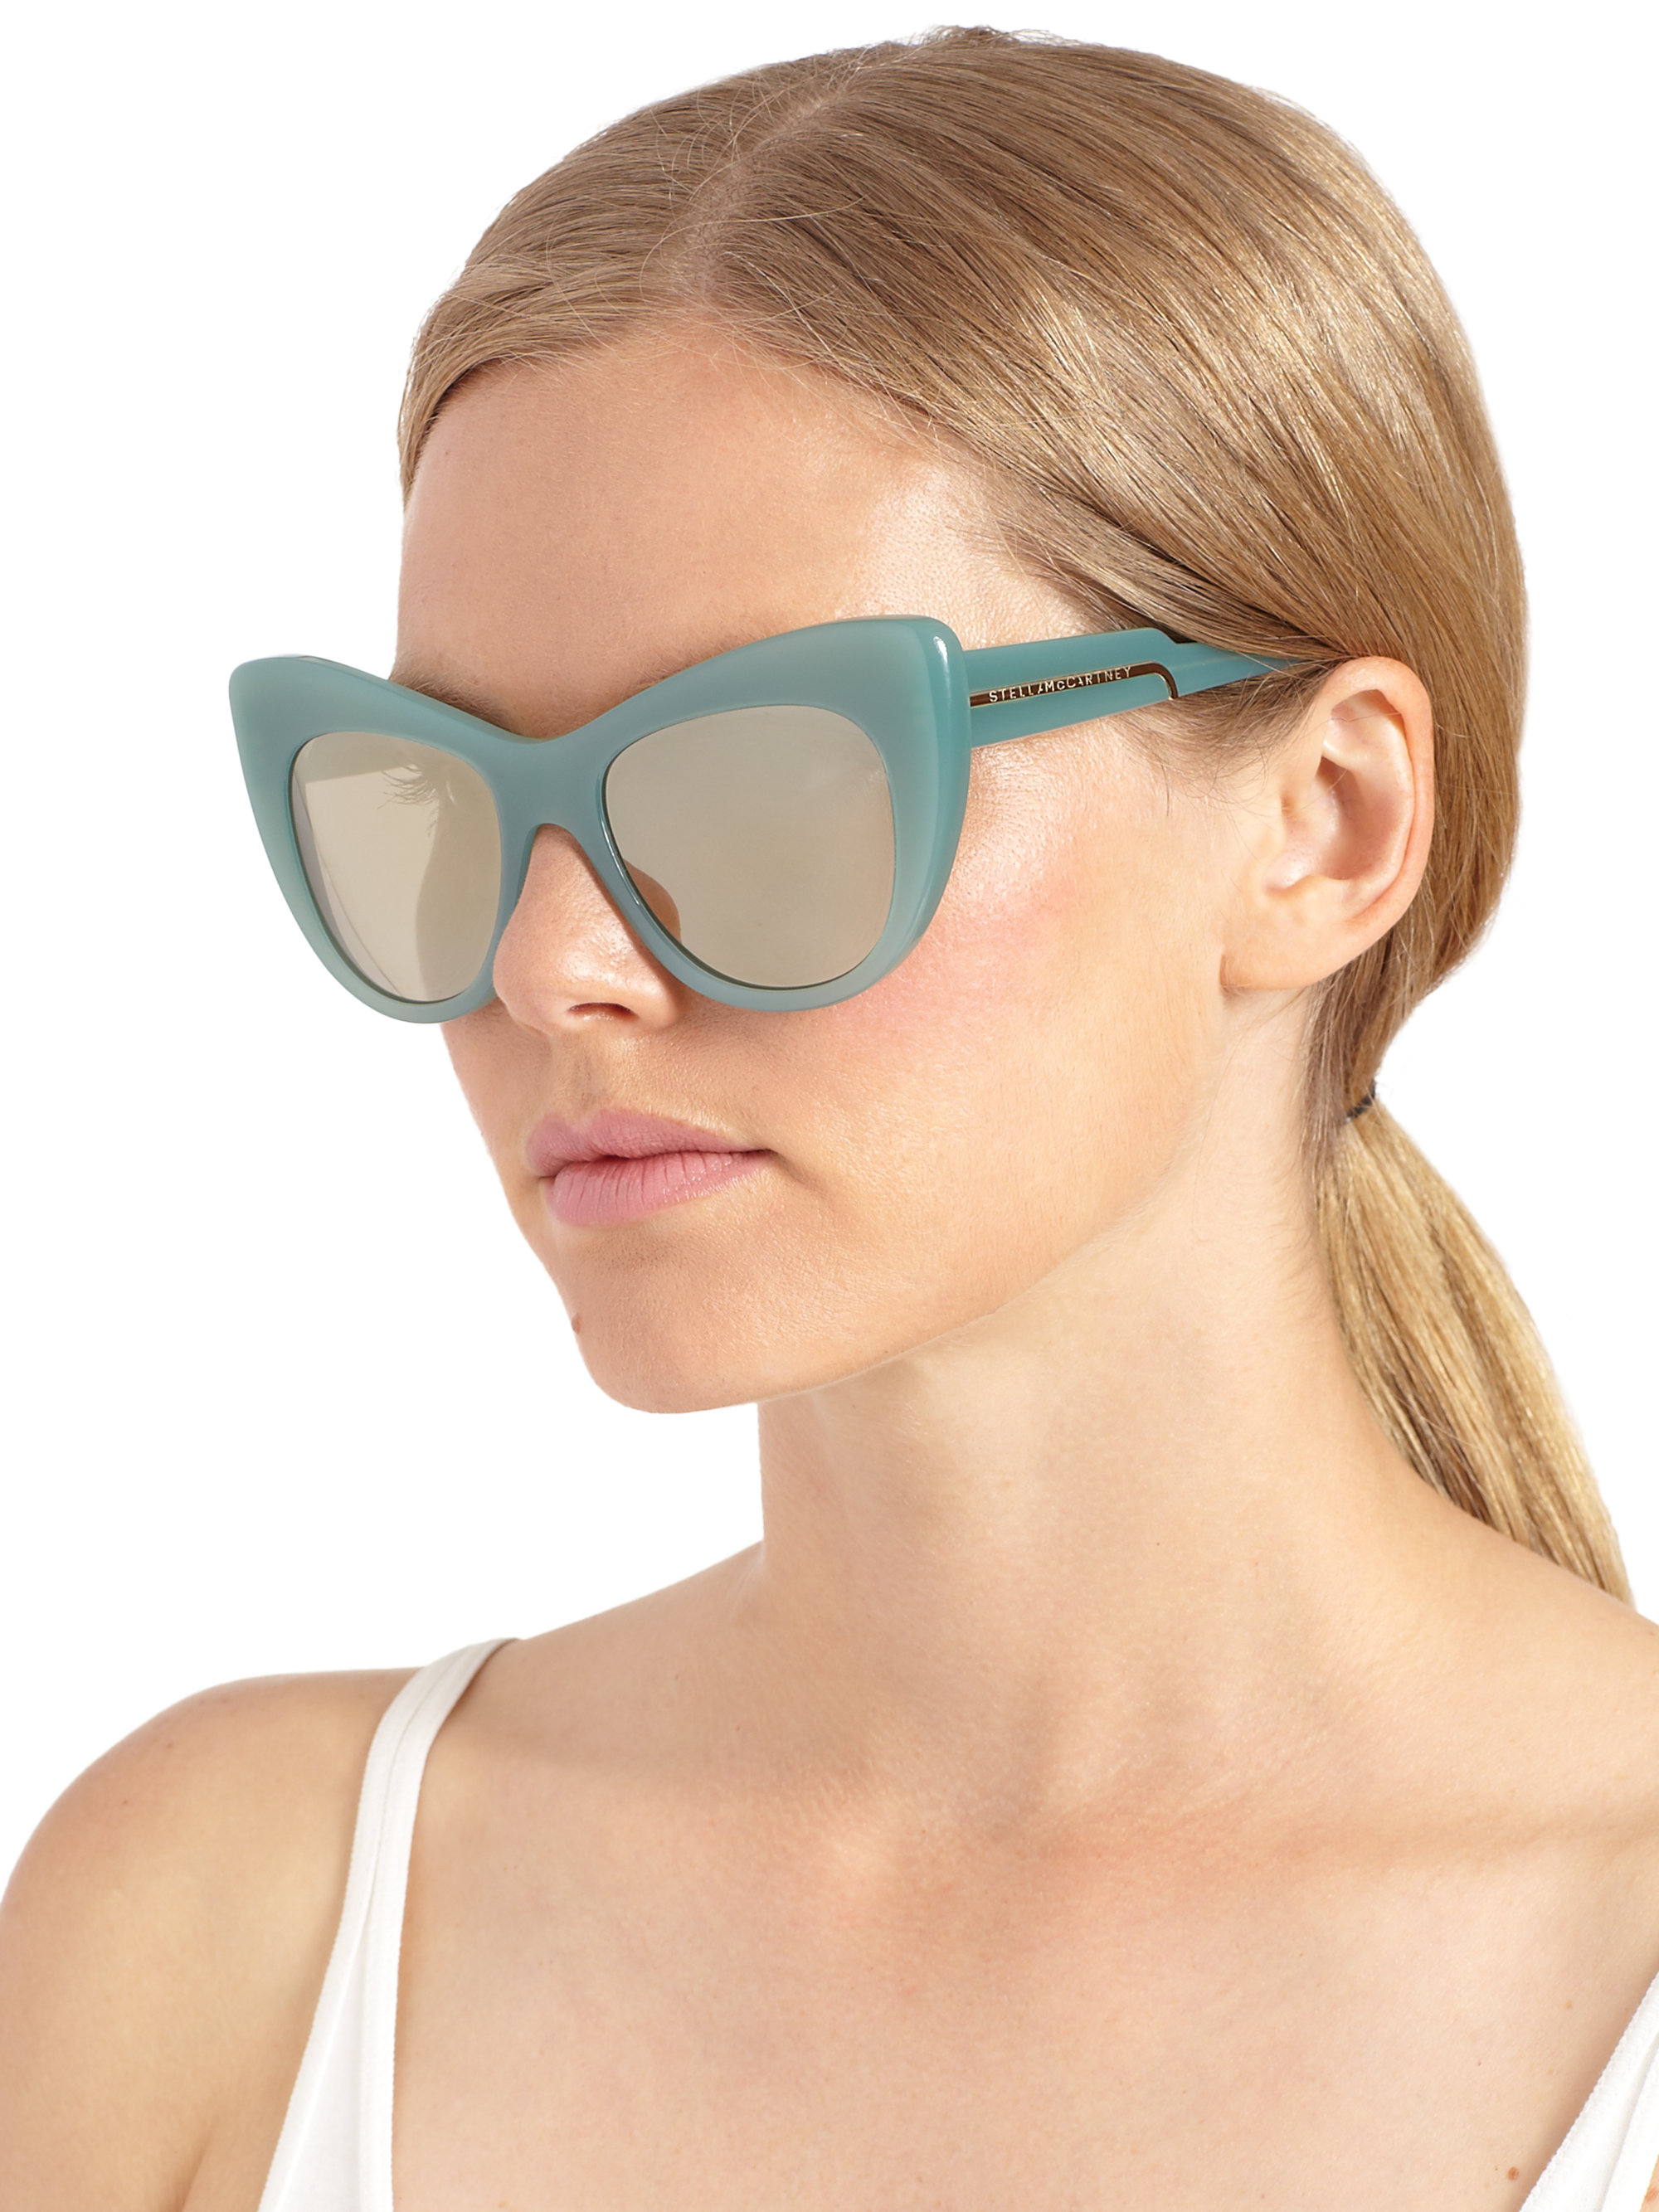 Stella Mccartney Sunglasses  stella mccartney oversized 54mm cat s eye sunglasses in blue lyst